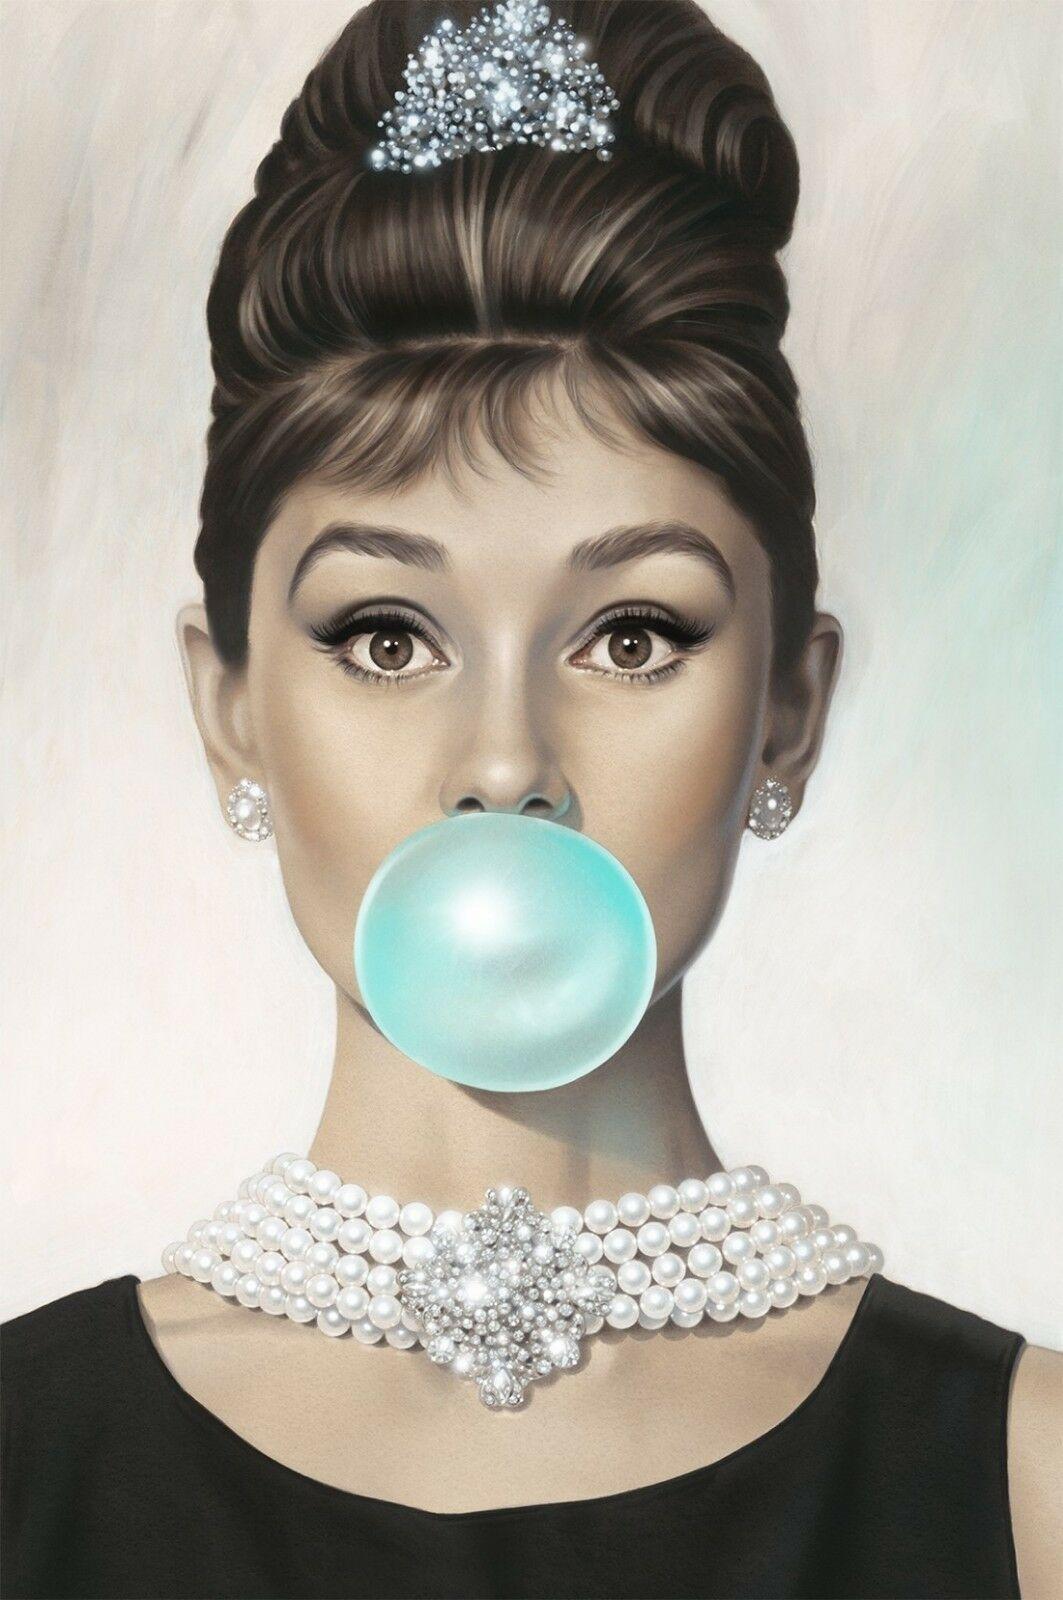 Audrey Hepburn - Blue Bubble Gum Actress   Audrey hepburn ...